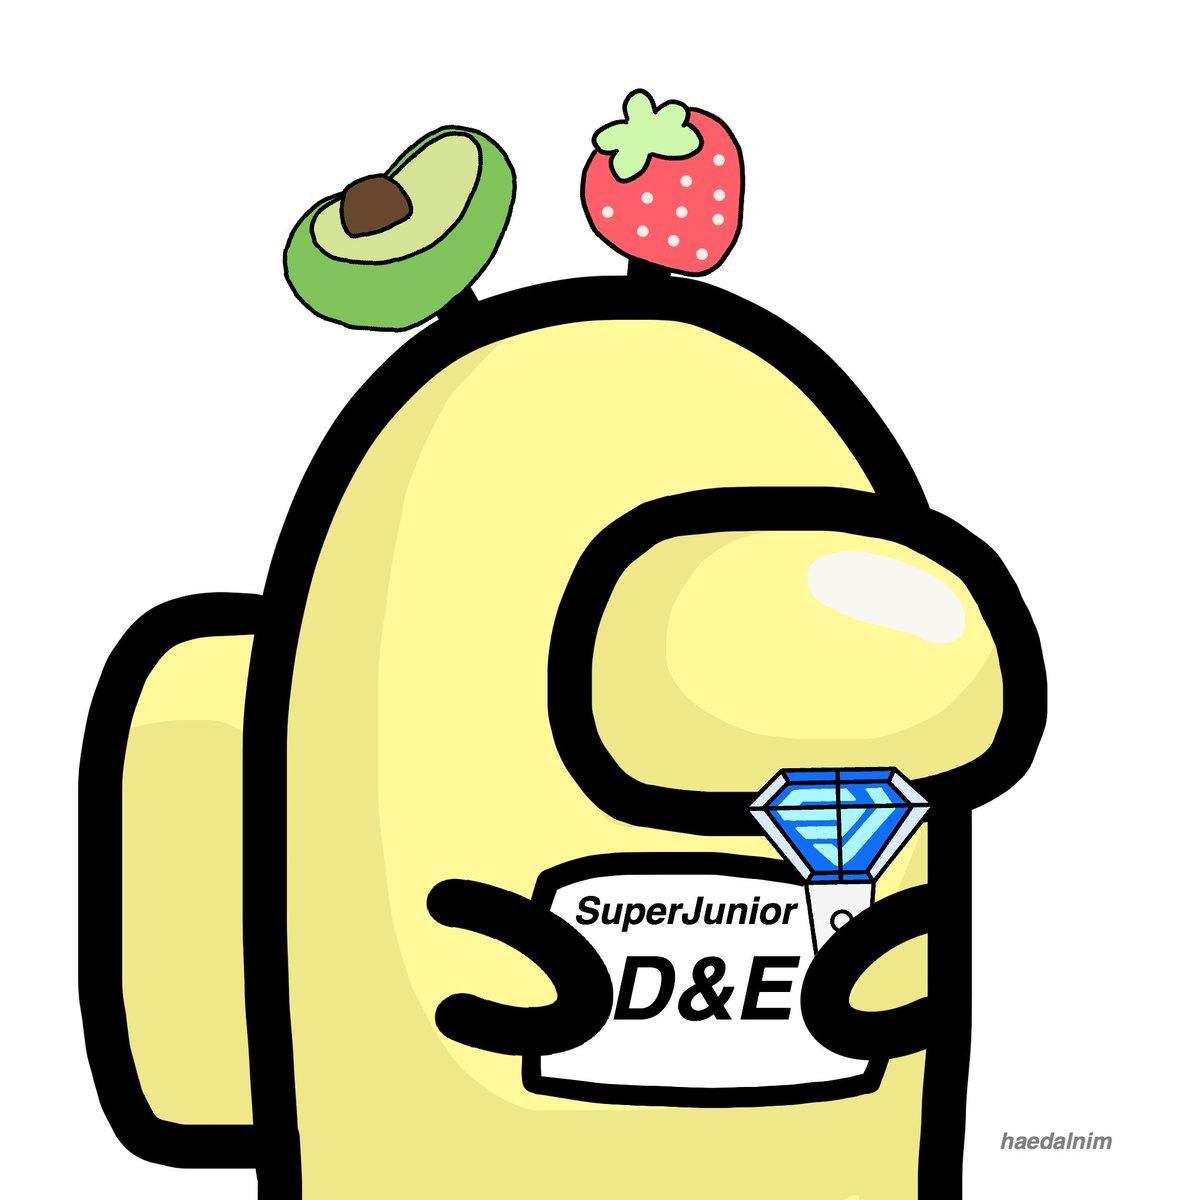 Who is the 𝗶𝗺𝗽𝗼𝘀𝘁𝗼𝗿?  #Donghae #Eunhyuk #Hyukjae #HaeHyuk #HaeEun #SuperJunior #SuperJunior_DnE #DnE #동해 #이동해 #東海 #李東海 #은혁 #혁재 #이혁재 #恩赫 #李赫宰 #Amongus #amongusfanart https://t.co/4PIwR2SNty